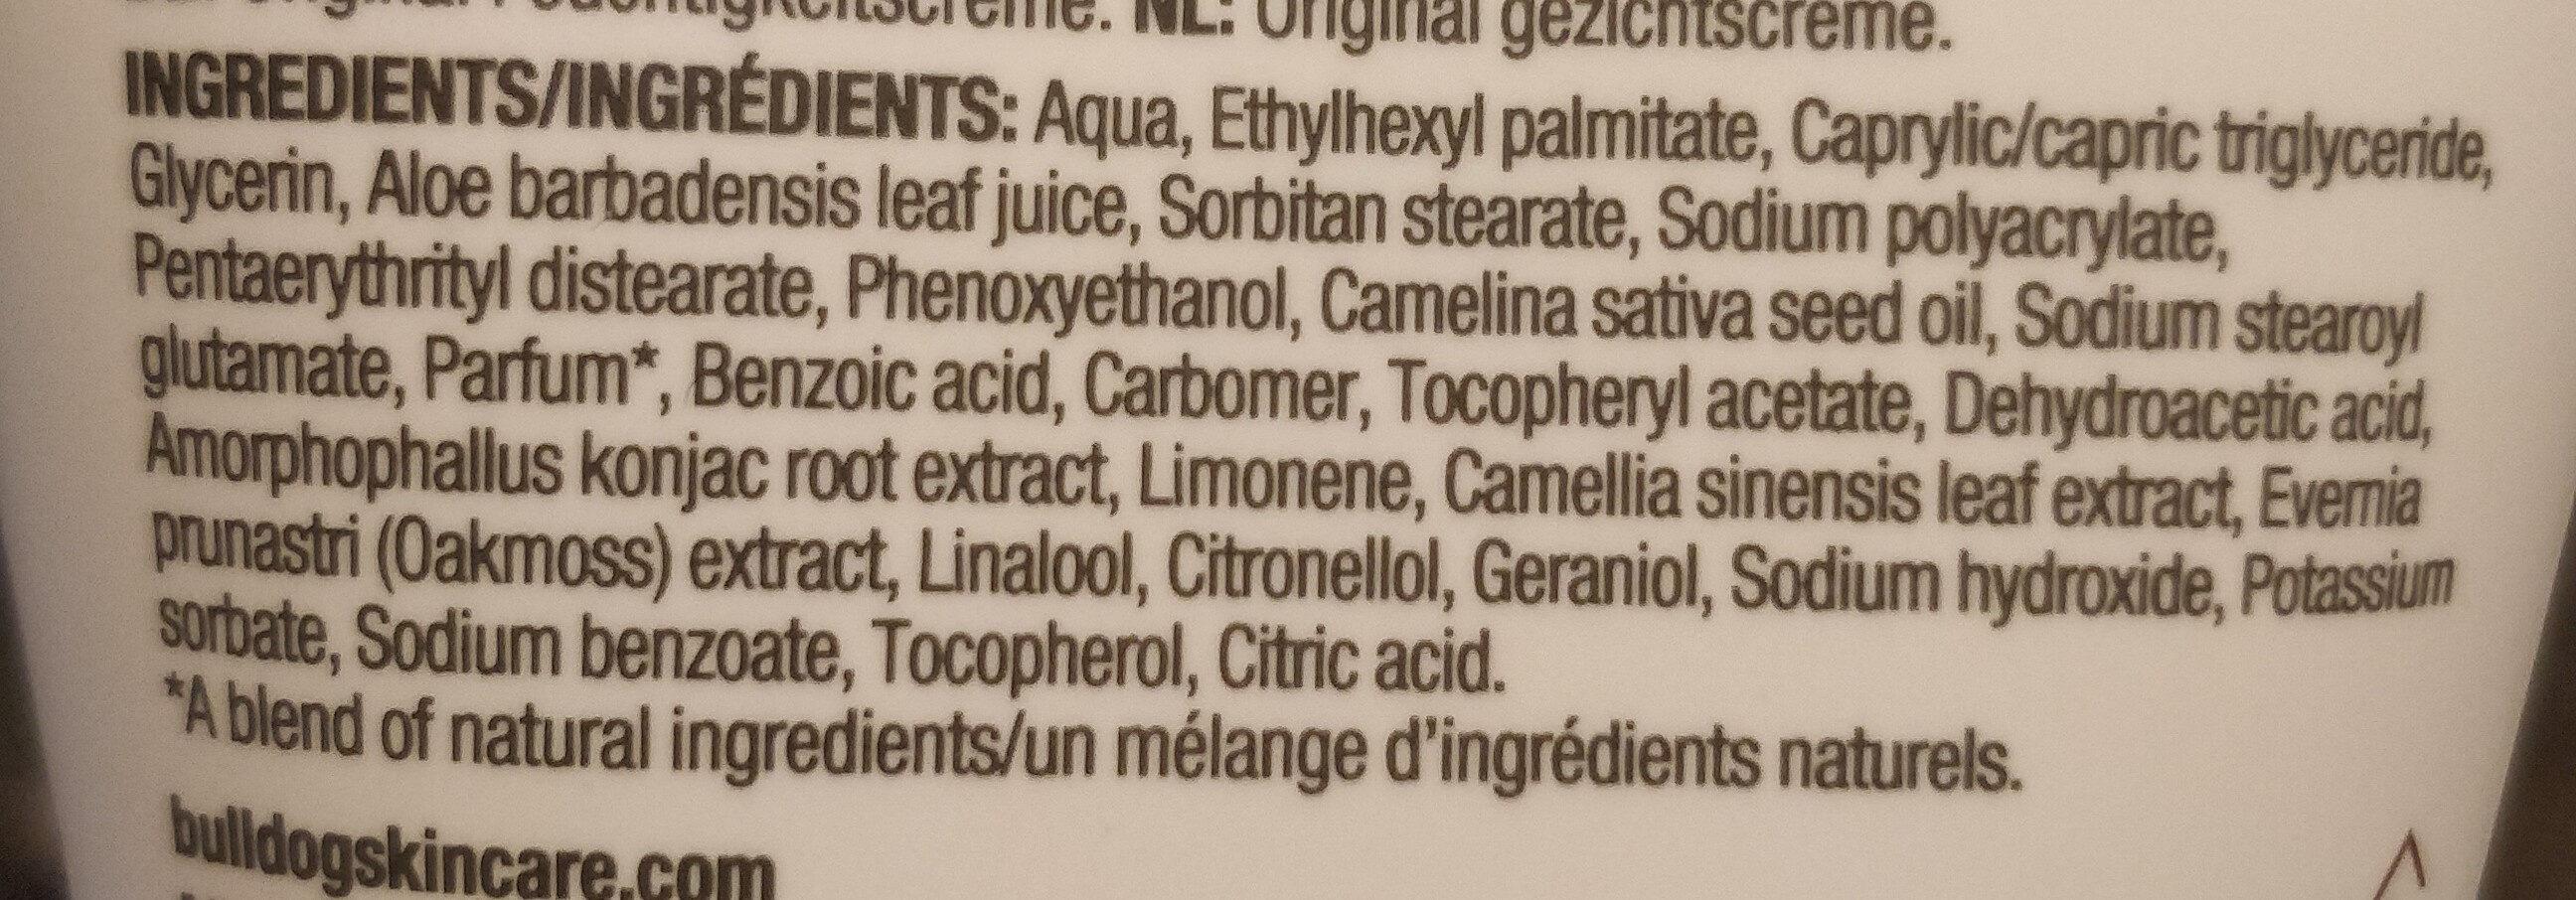 Bull Dog soin hydratant - Ingredients - fr